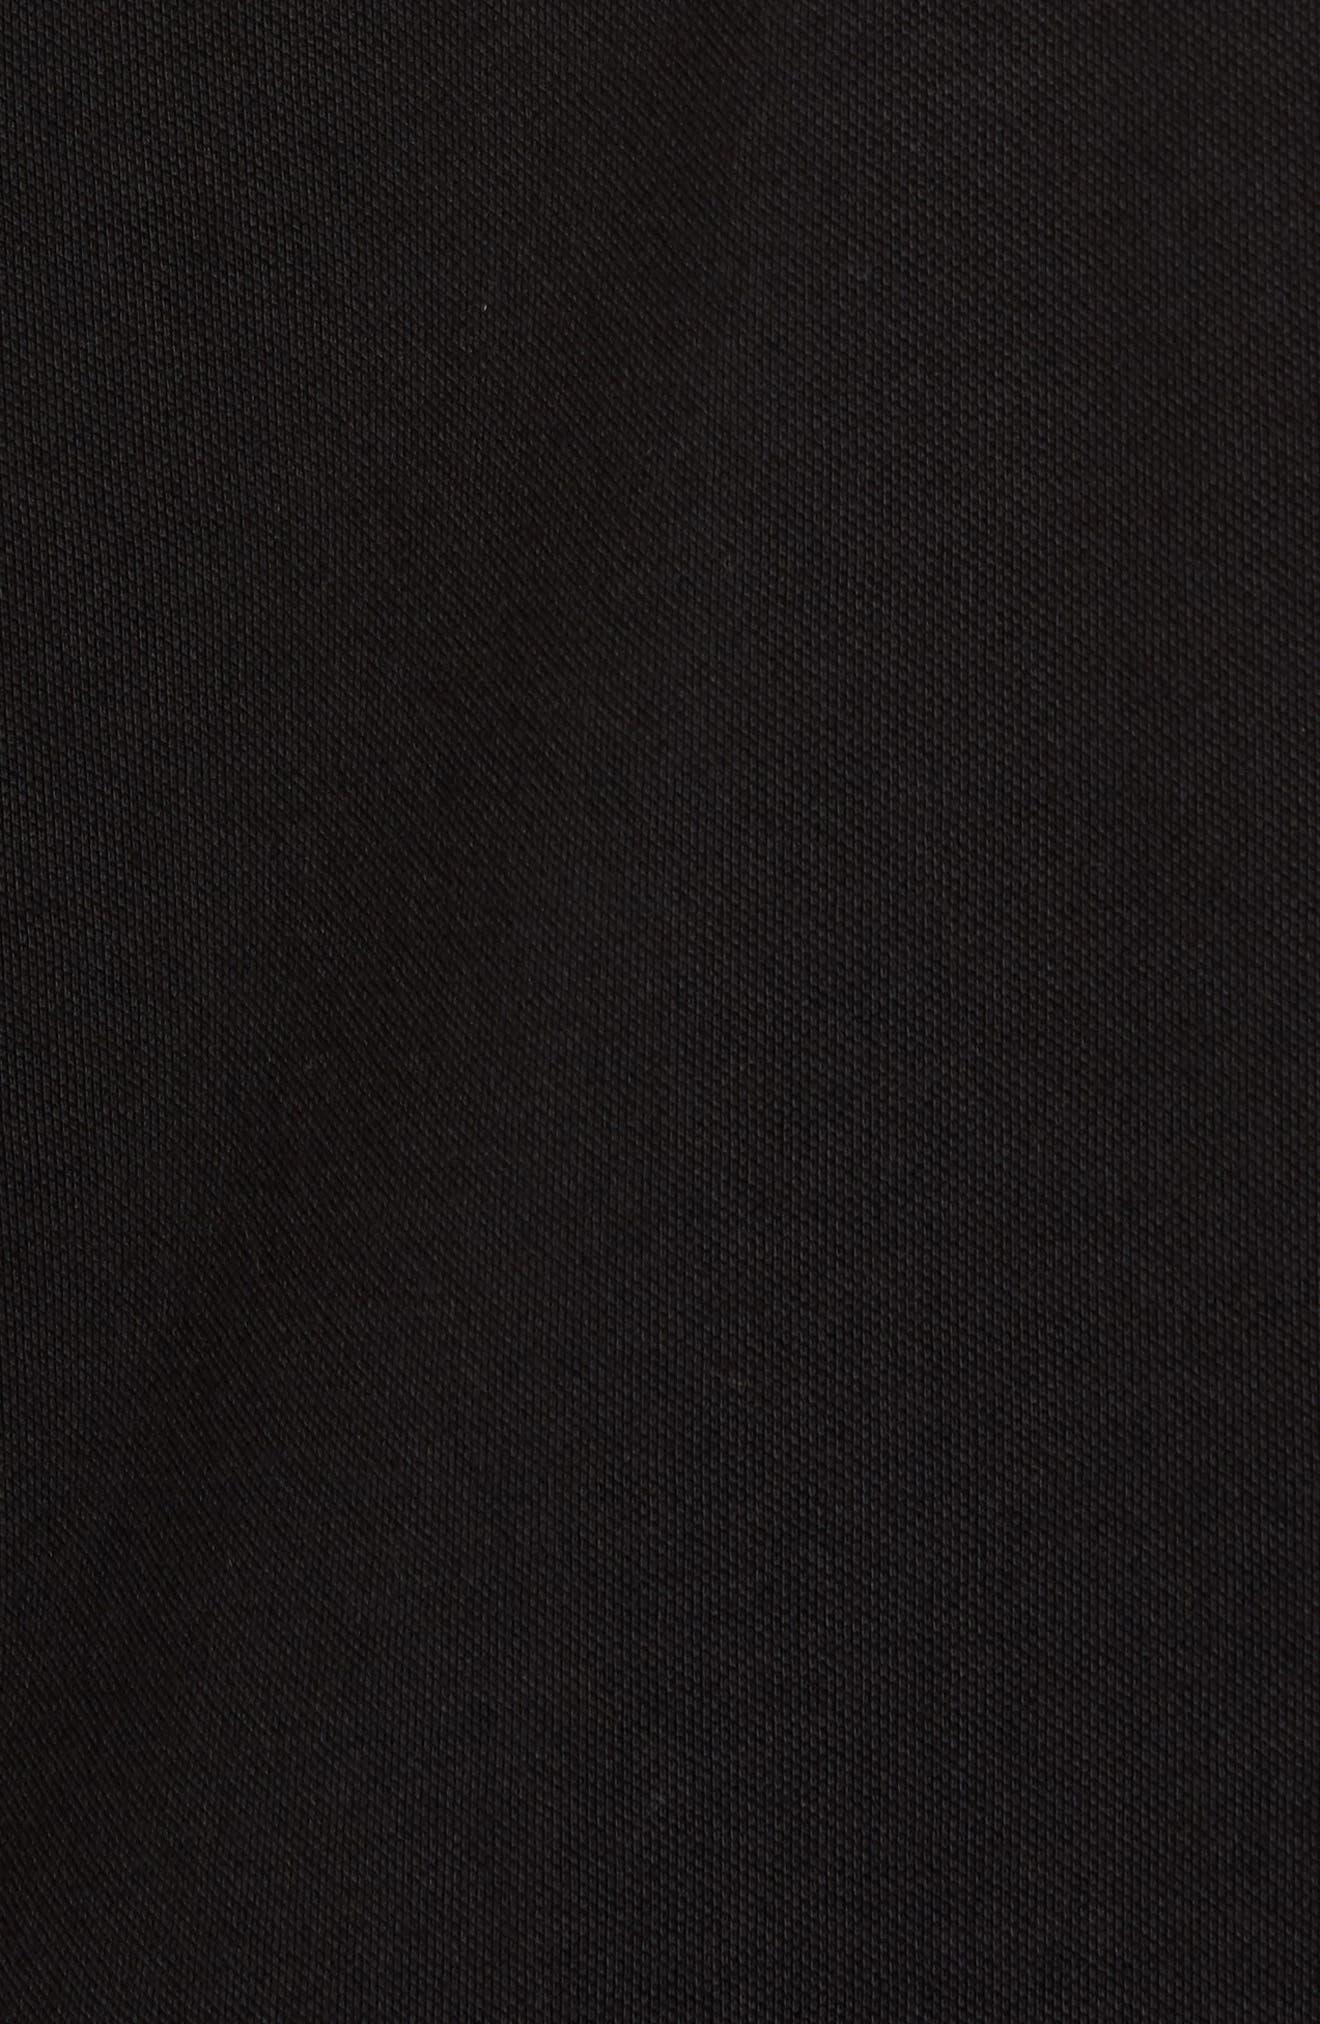 Shively Piqué Knit Sport Shirt,                             Alternate thumbnail 5, color,                             001